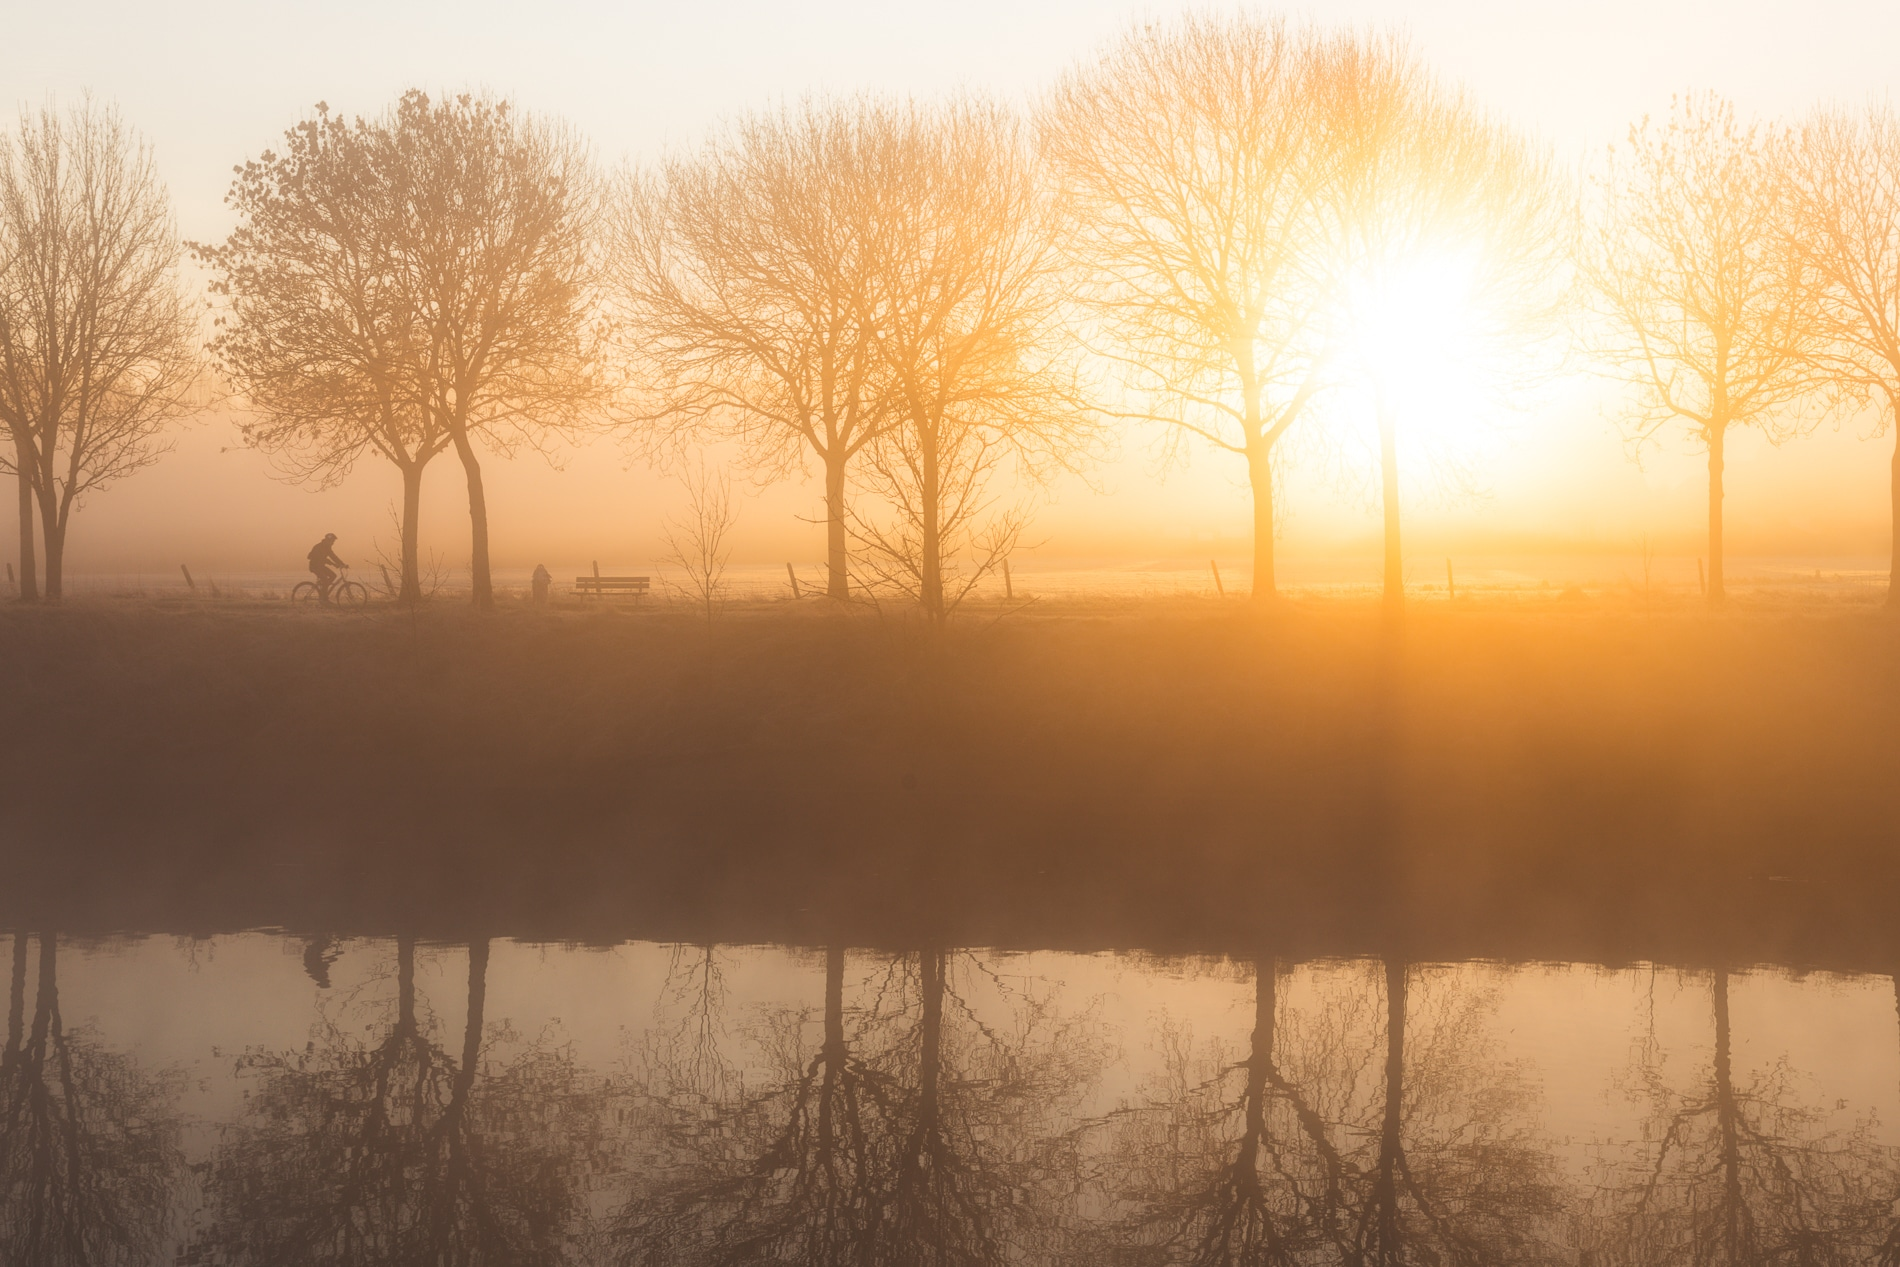 Fotografie Krist Hooghe Kalender Menen Januari Watertoren Palma